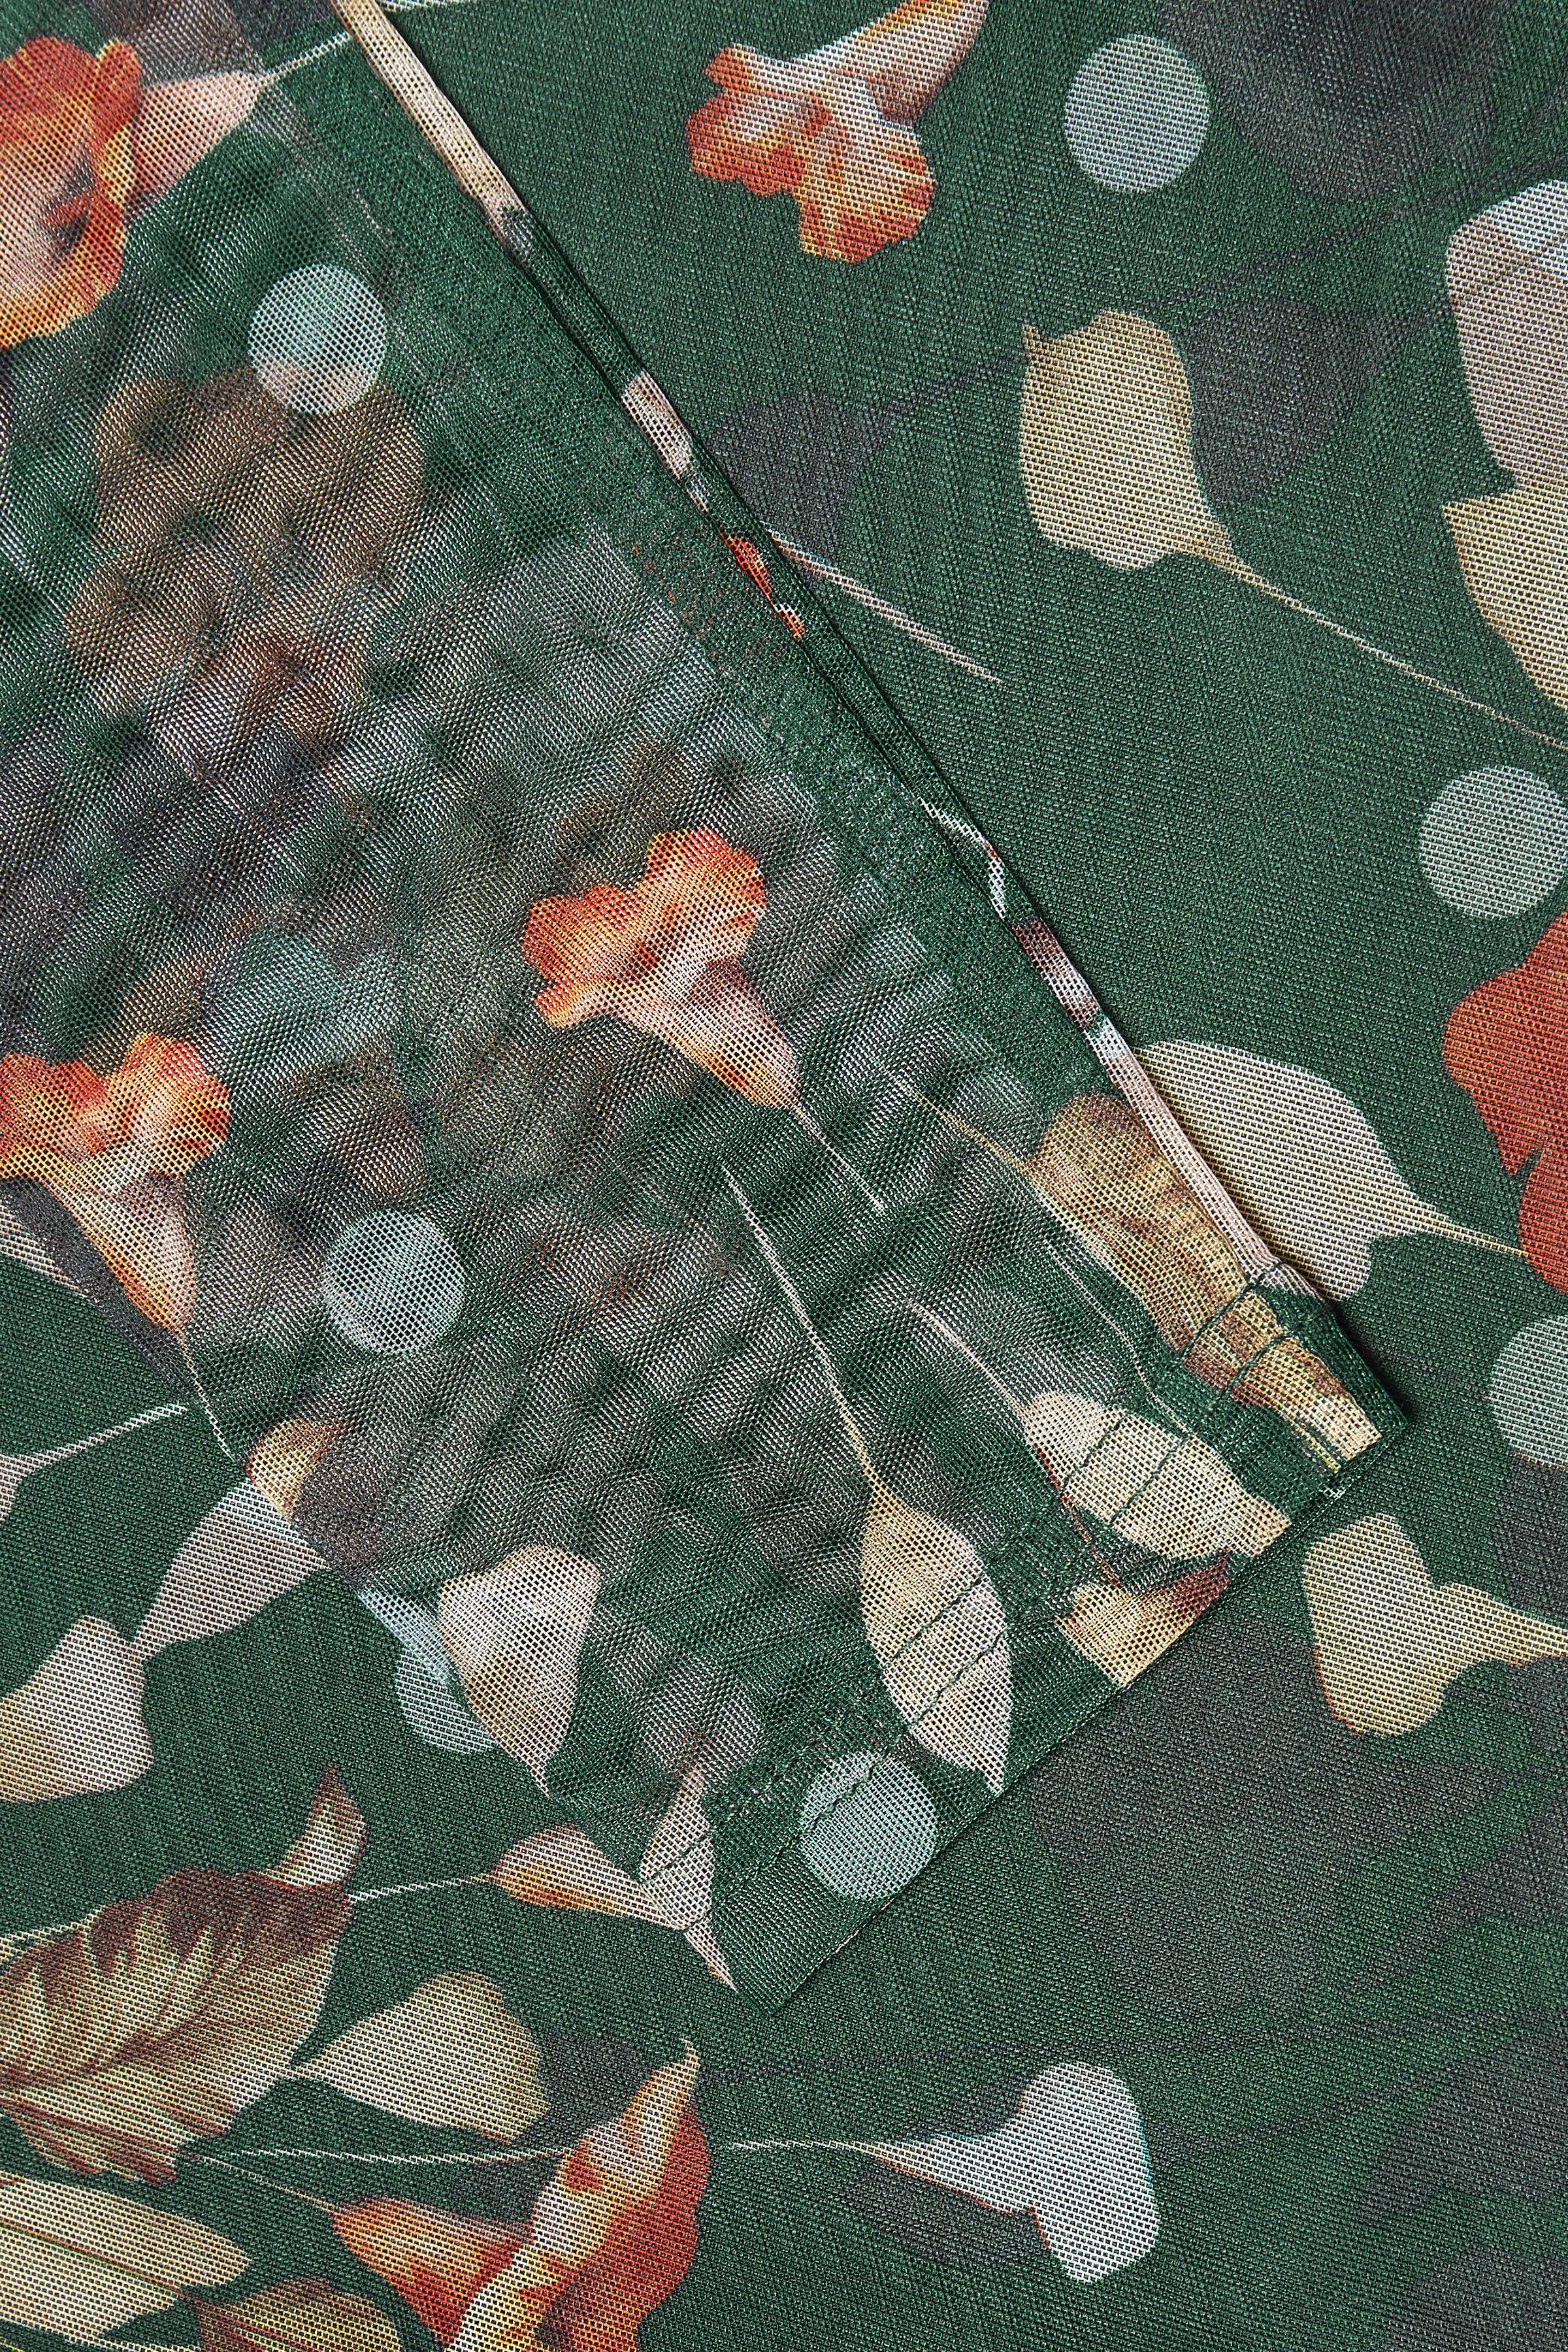 Dunkelgrün/gebranntes orange Langarm-Bluse von Kaffe – Shoppen SieDunkelgrün/gebranntes orange Langarm-Bluse ab Gr. XS-XXL hier